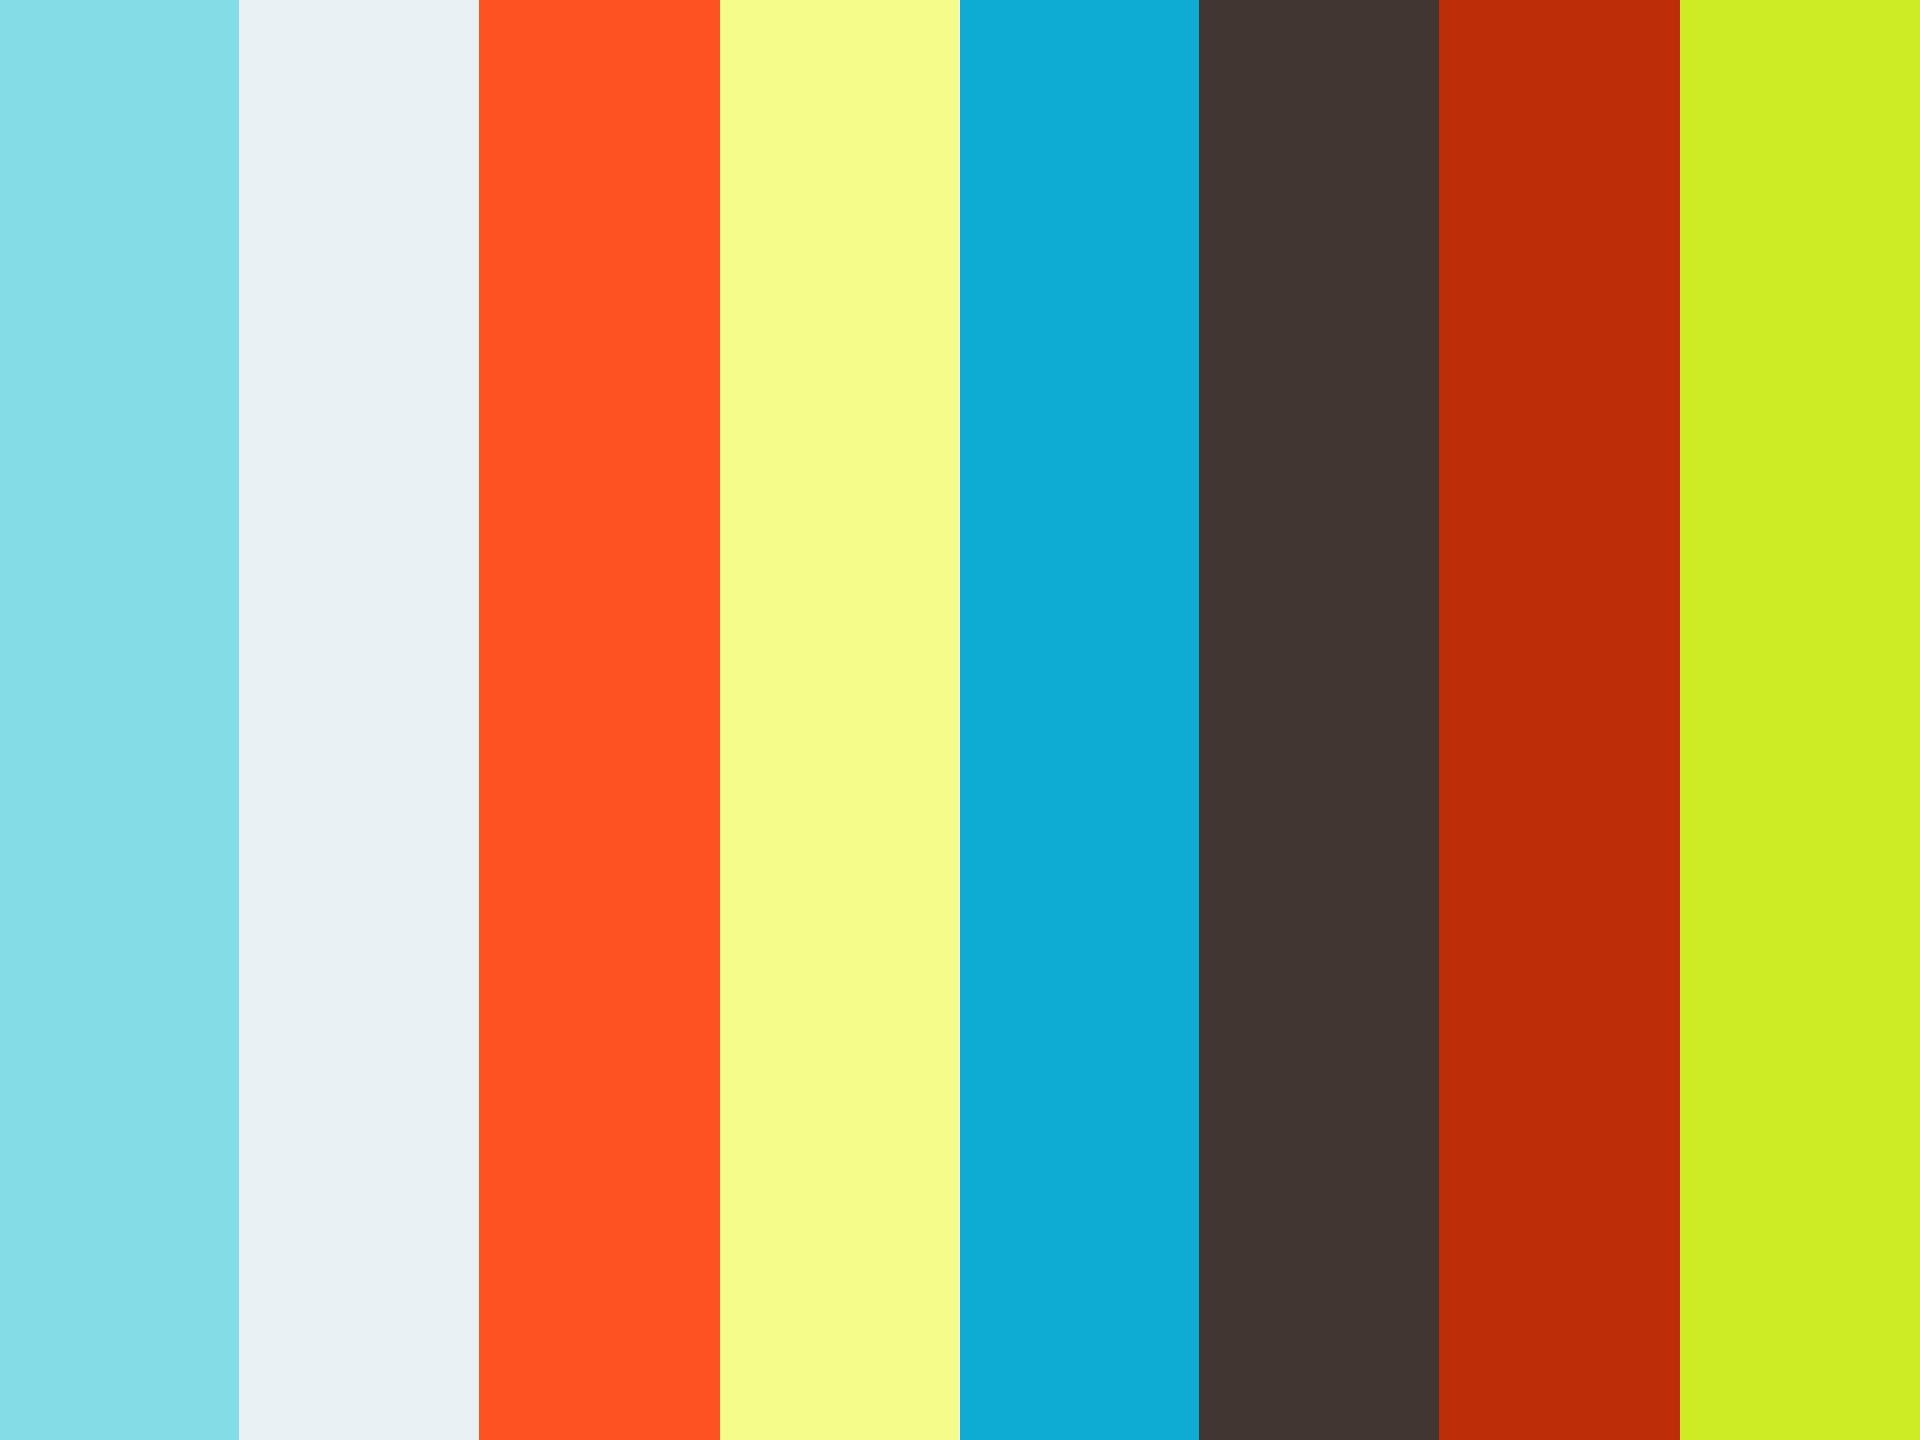 IPS e.max ジルキャド MT マルチ チェアサイドブロック草間幸夫先生によるビデオセミナー 【全10動画】 #4 新しい酸化ジルコニウムIPS e.maxジルキャドMTマルチの有用性